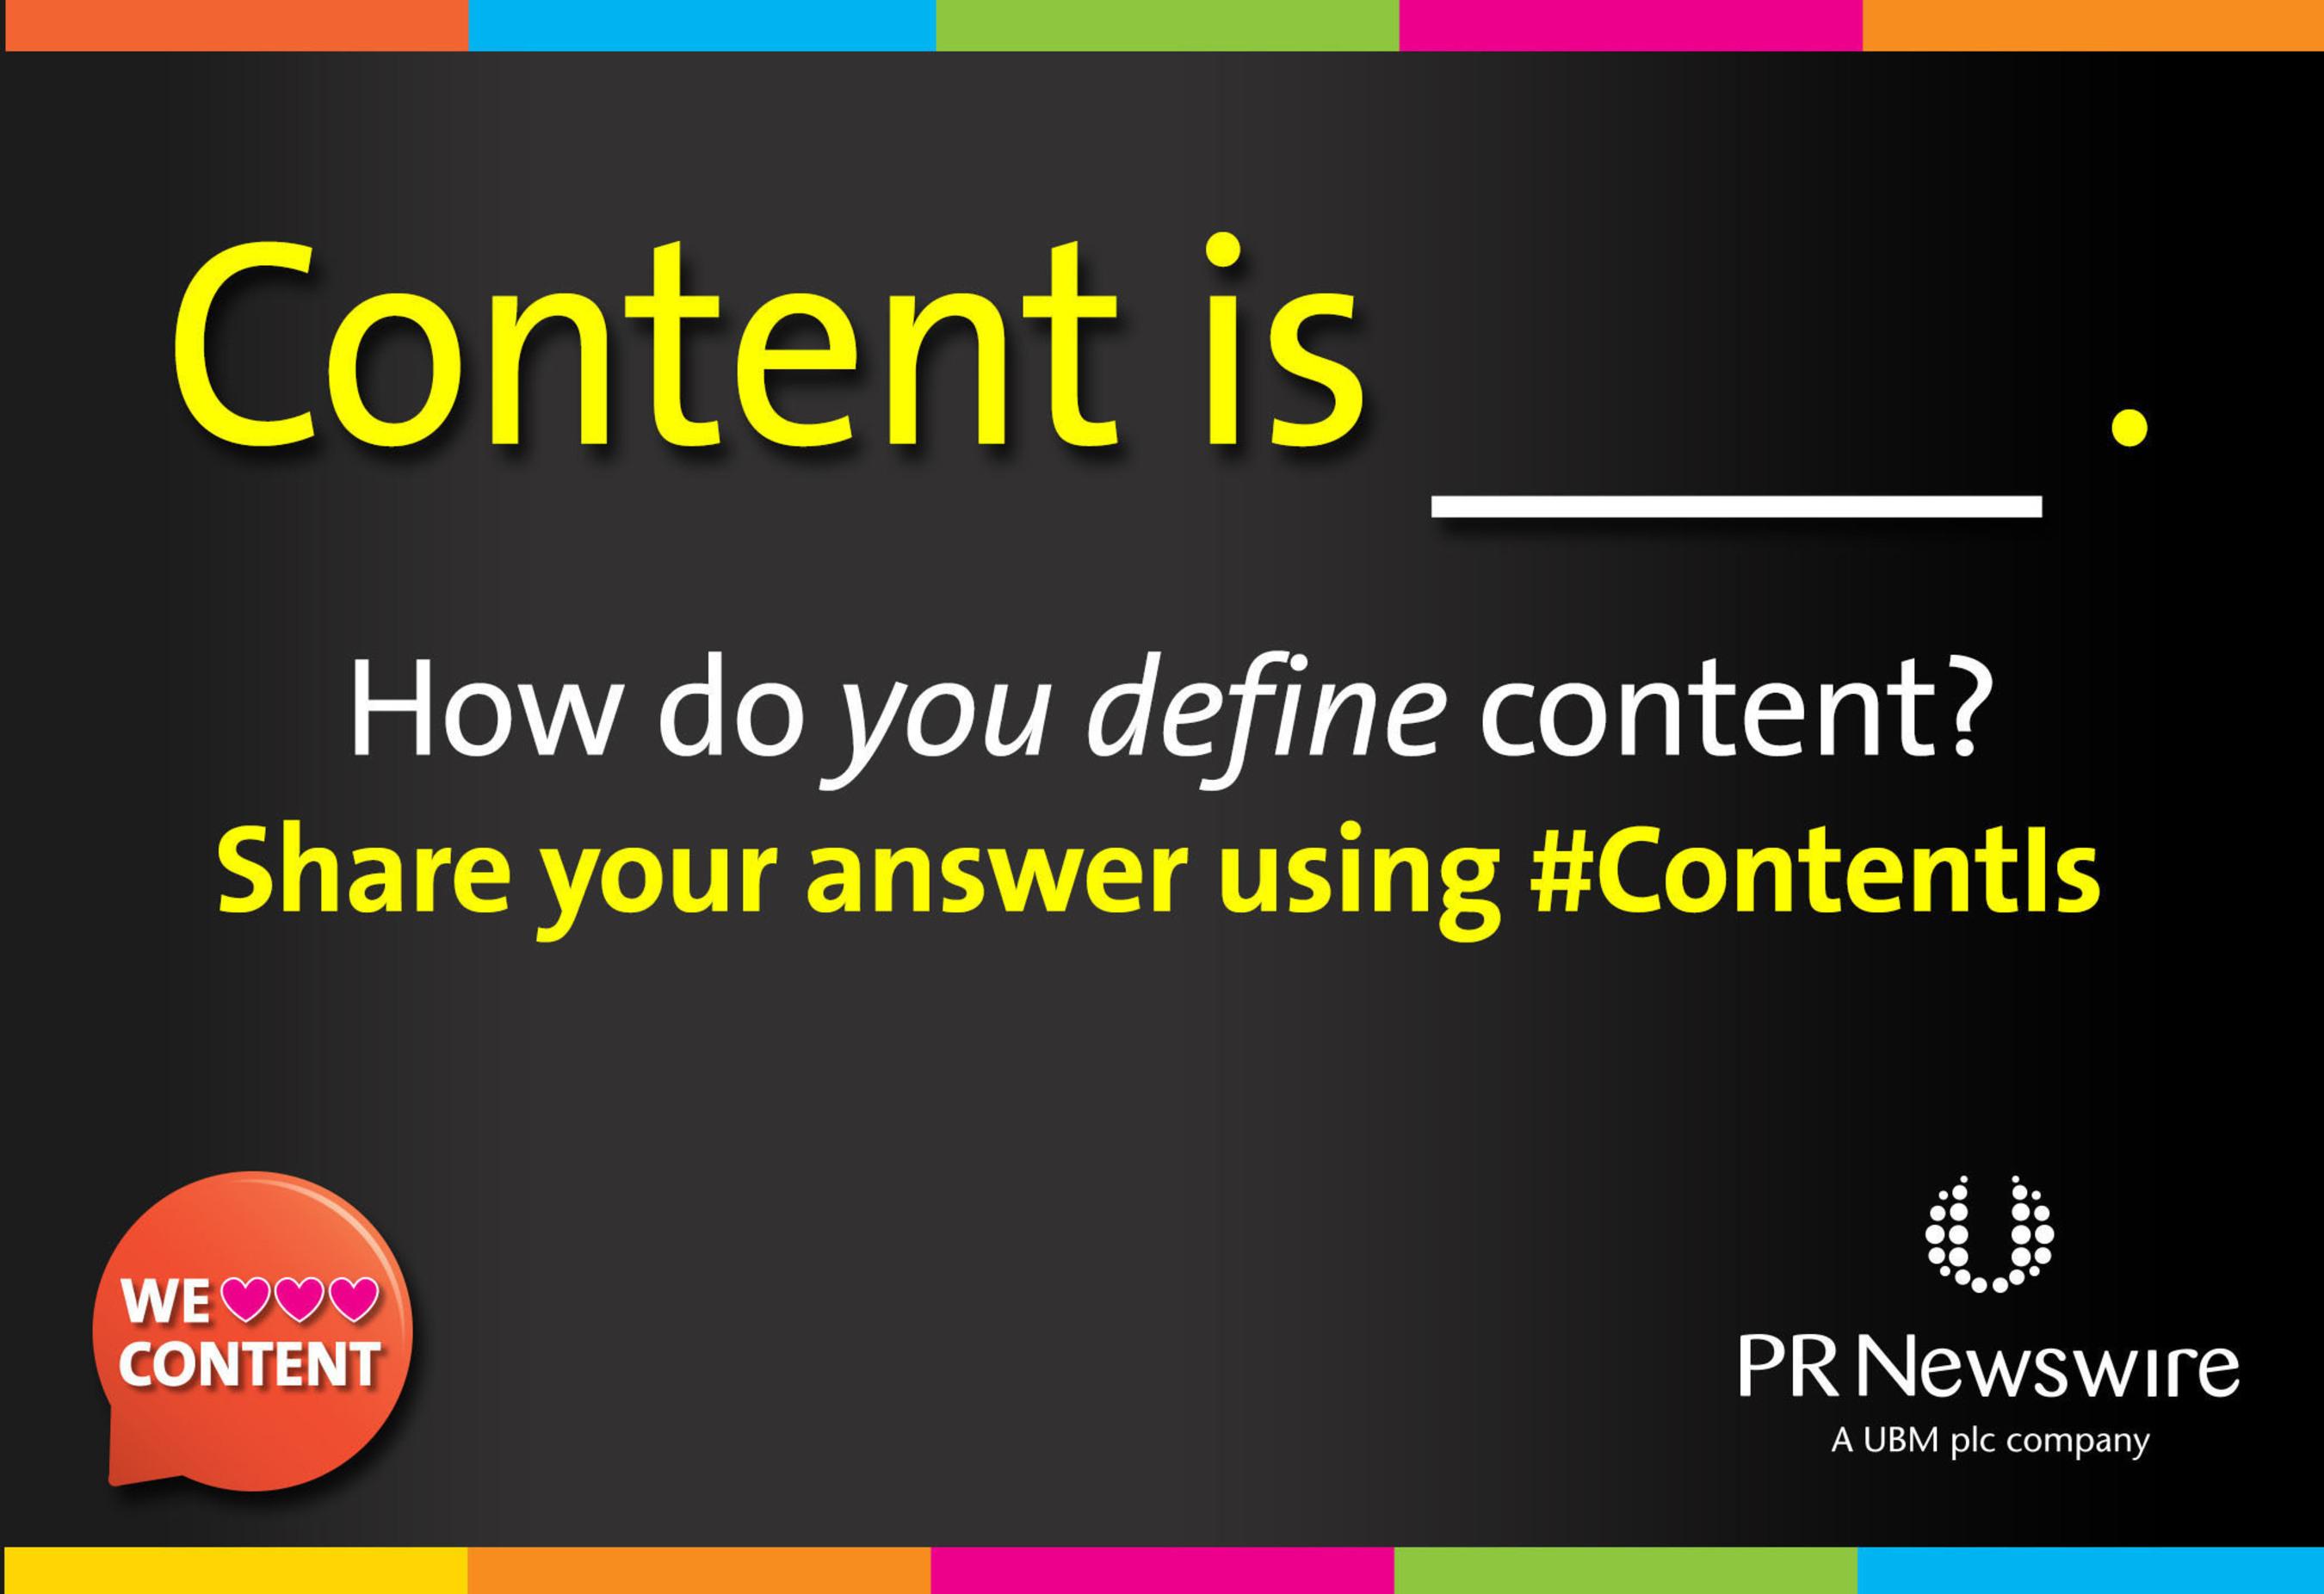 Courtesy PR Newswire, Content Is ___ Campaign for Content Marketing World 2013. (PRNewsFoto/PR Newswire Association LLC)